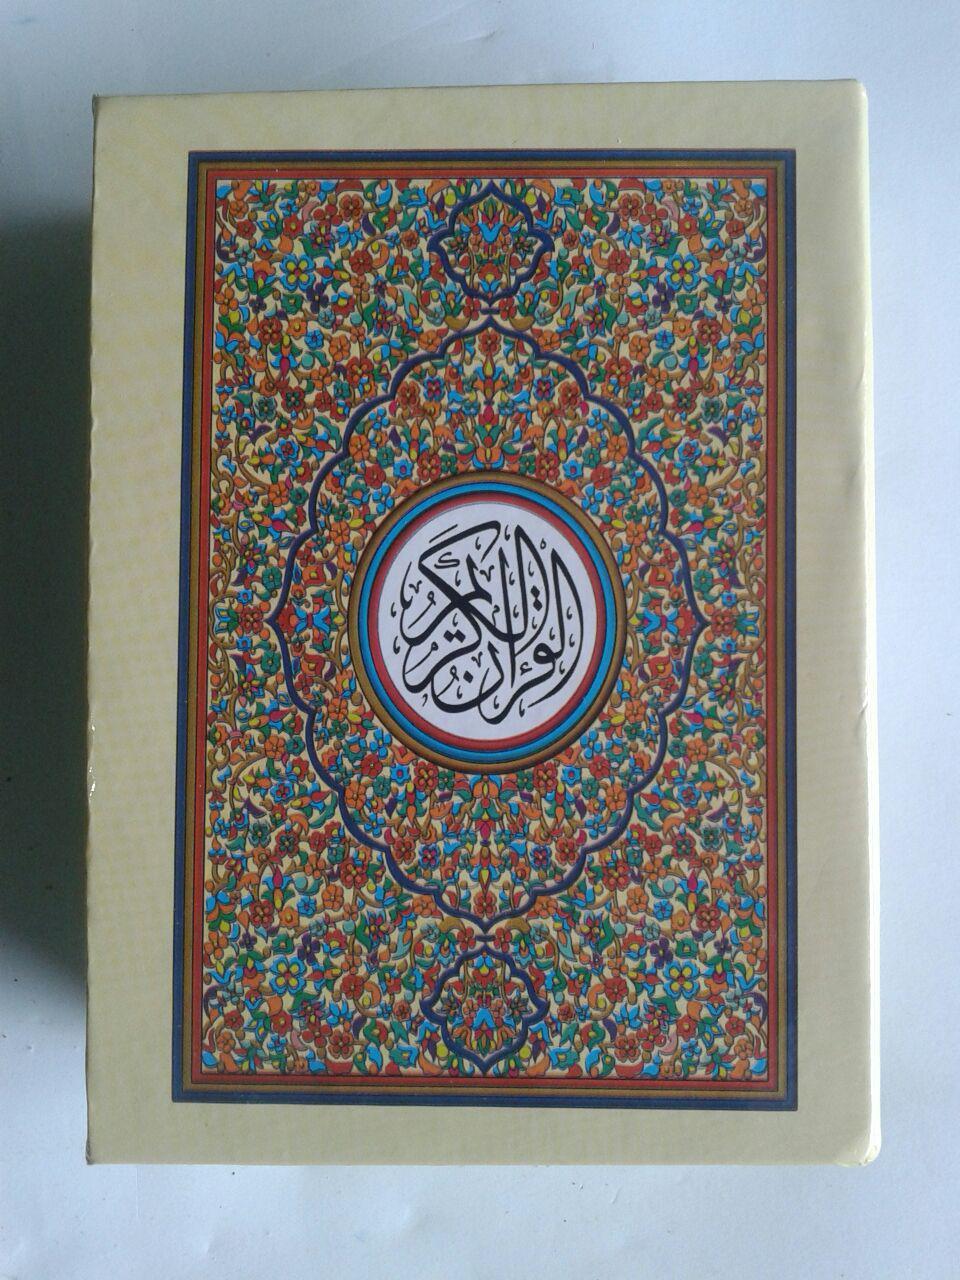 Al-Qur'an Impor Per Juz Tanpa Terjemah Ukuran 10x14 cover